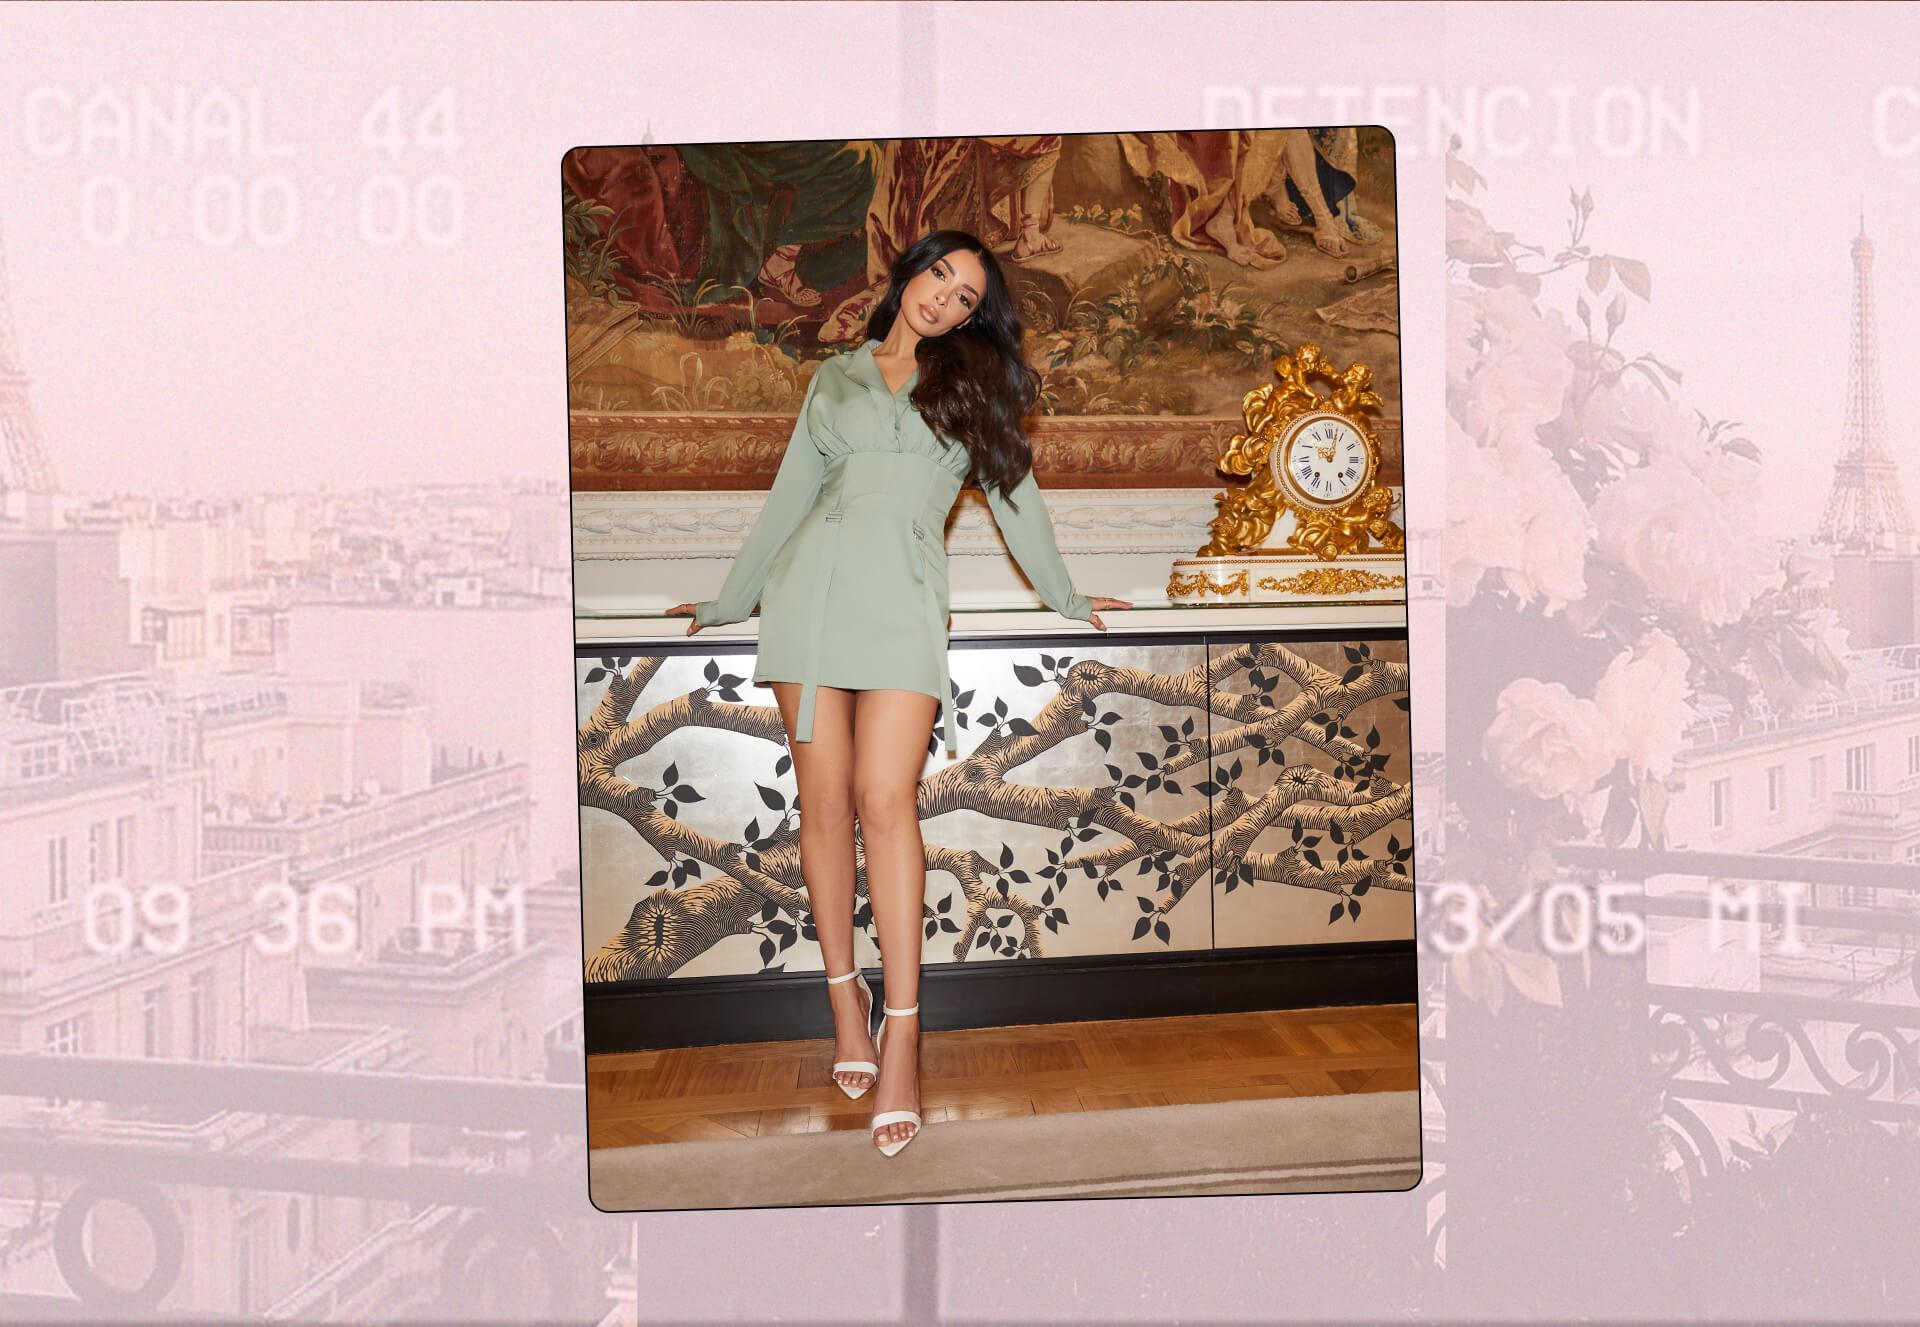 Sananas Lookbook Desktop Image 8